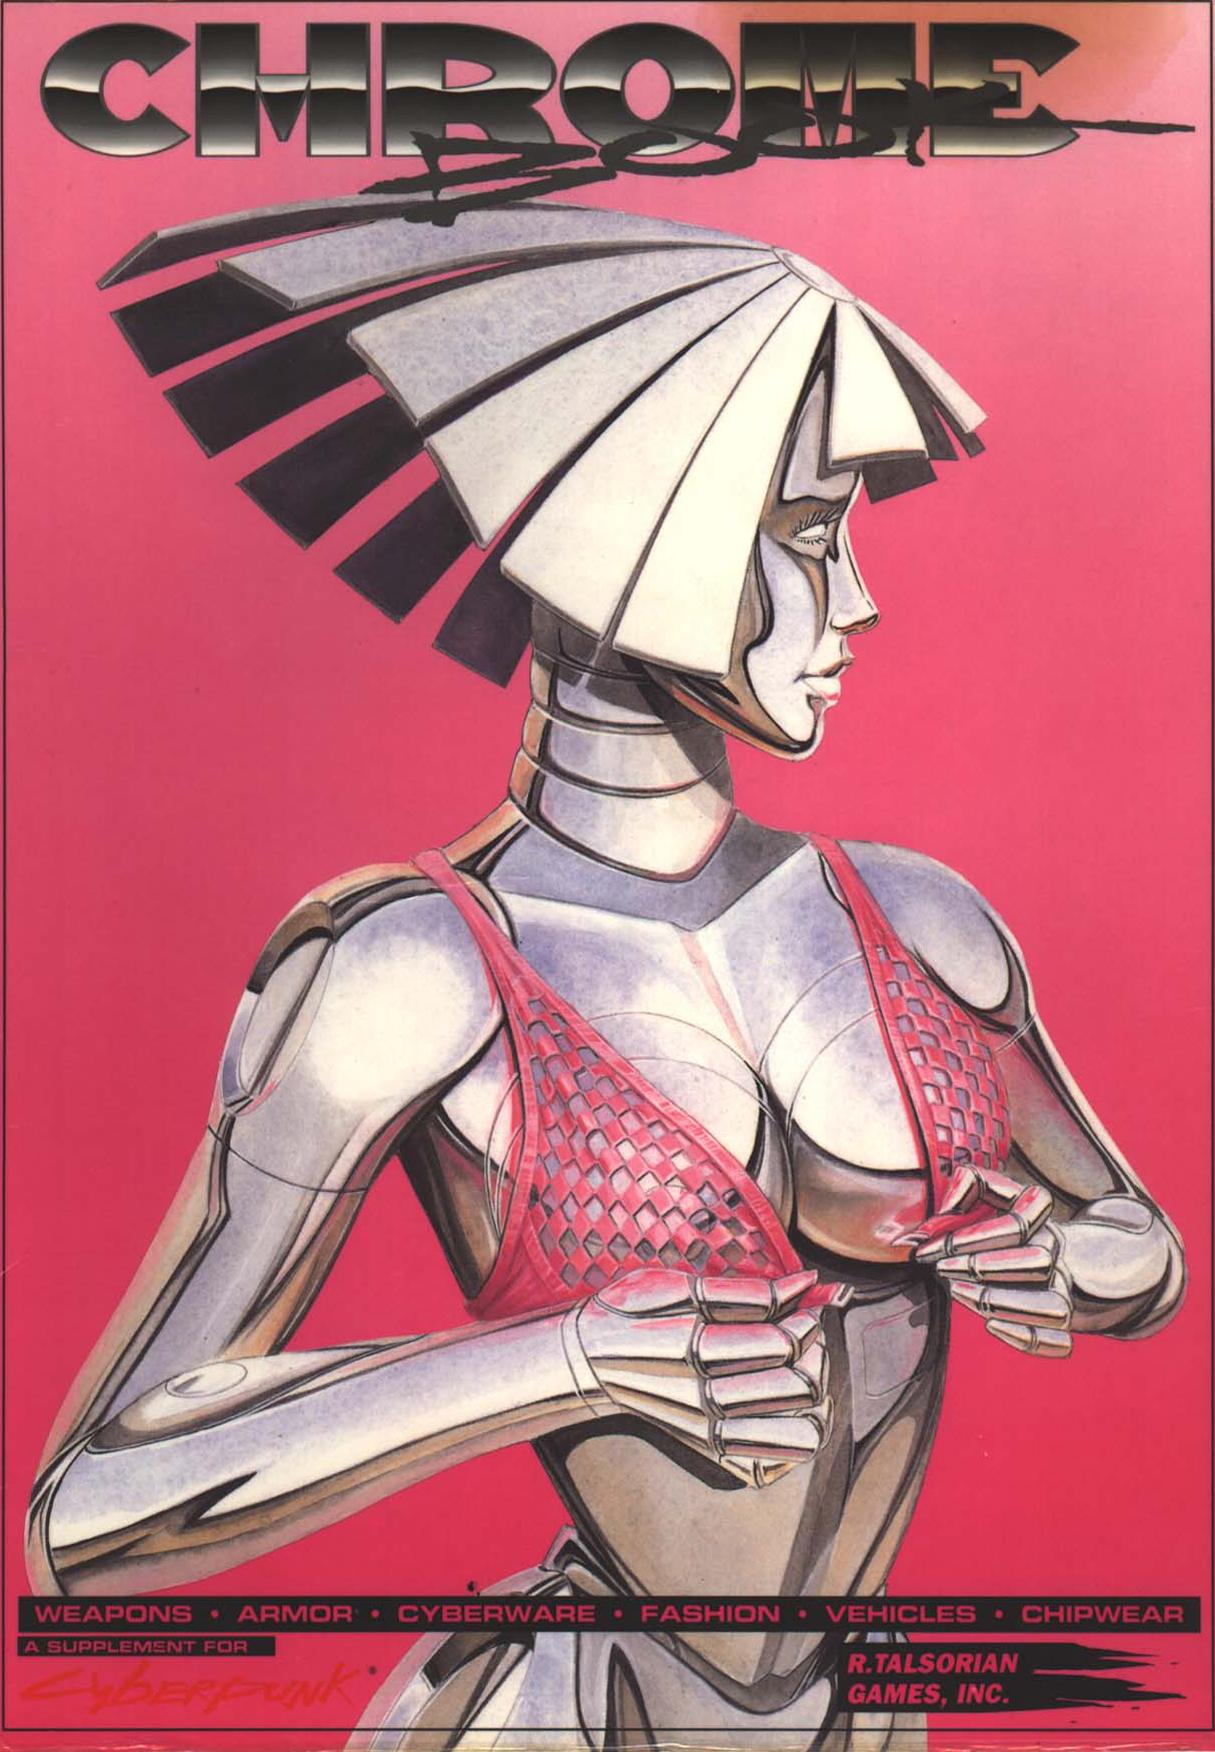 Cyberpunk Chrome Book R Talsorian Games (1991